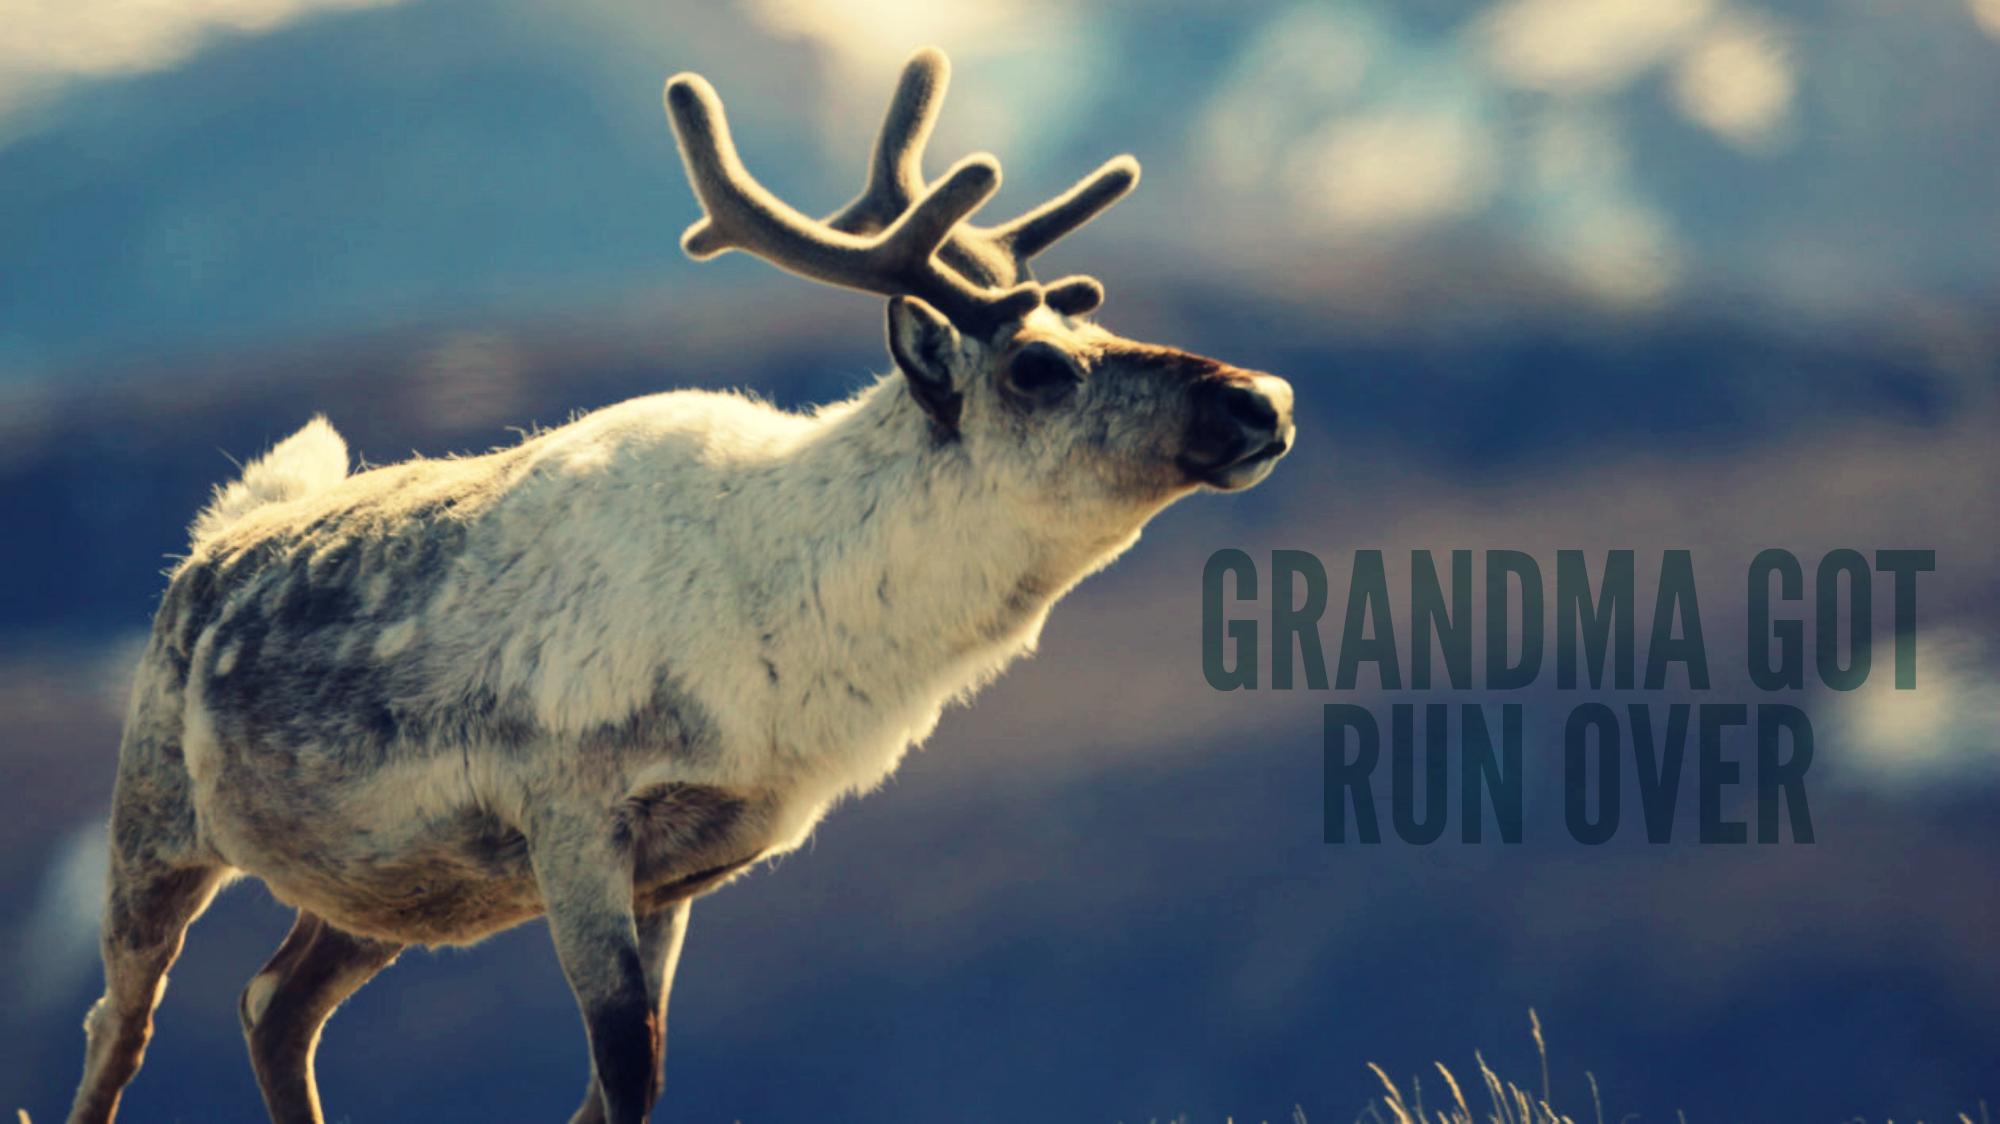 elmopatsyvevo 56k subscribers subscribe elmo patsy grandma got run over by a reindeer